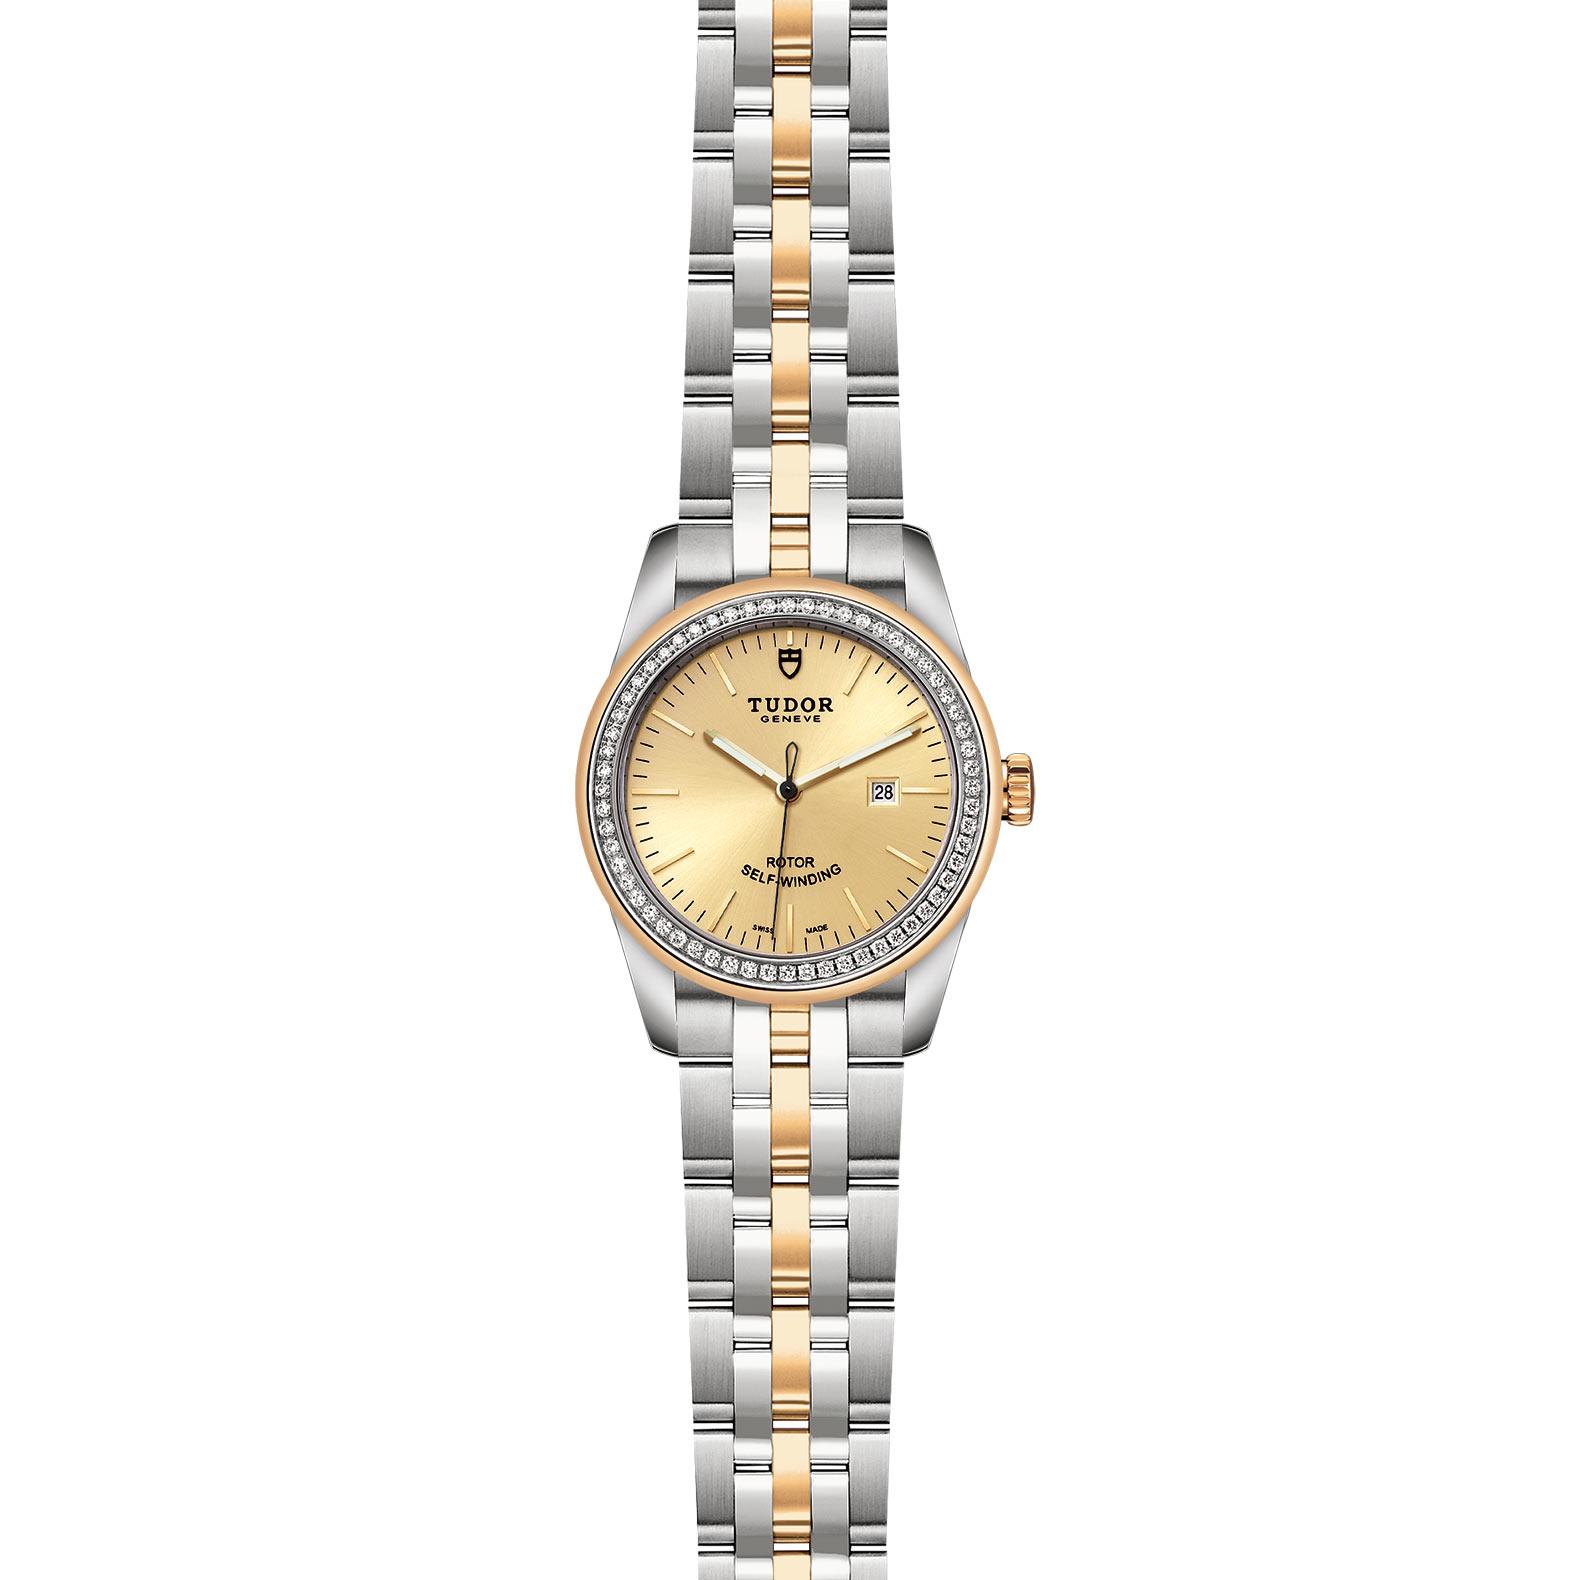 TUDOR Glamour Date M53023 0020 Frontfacing